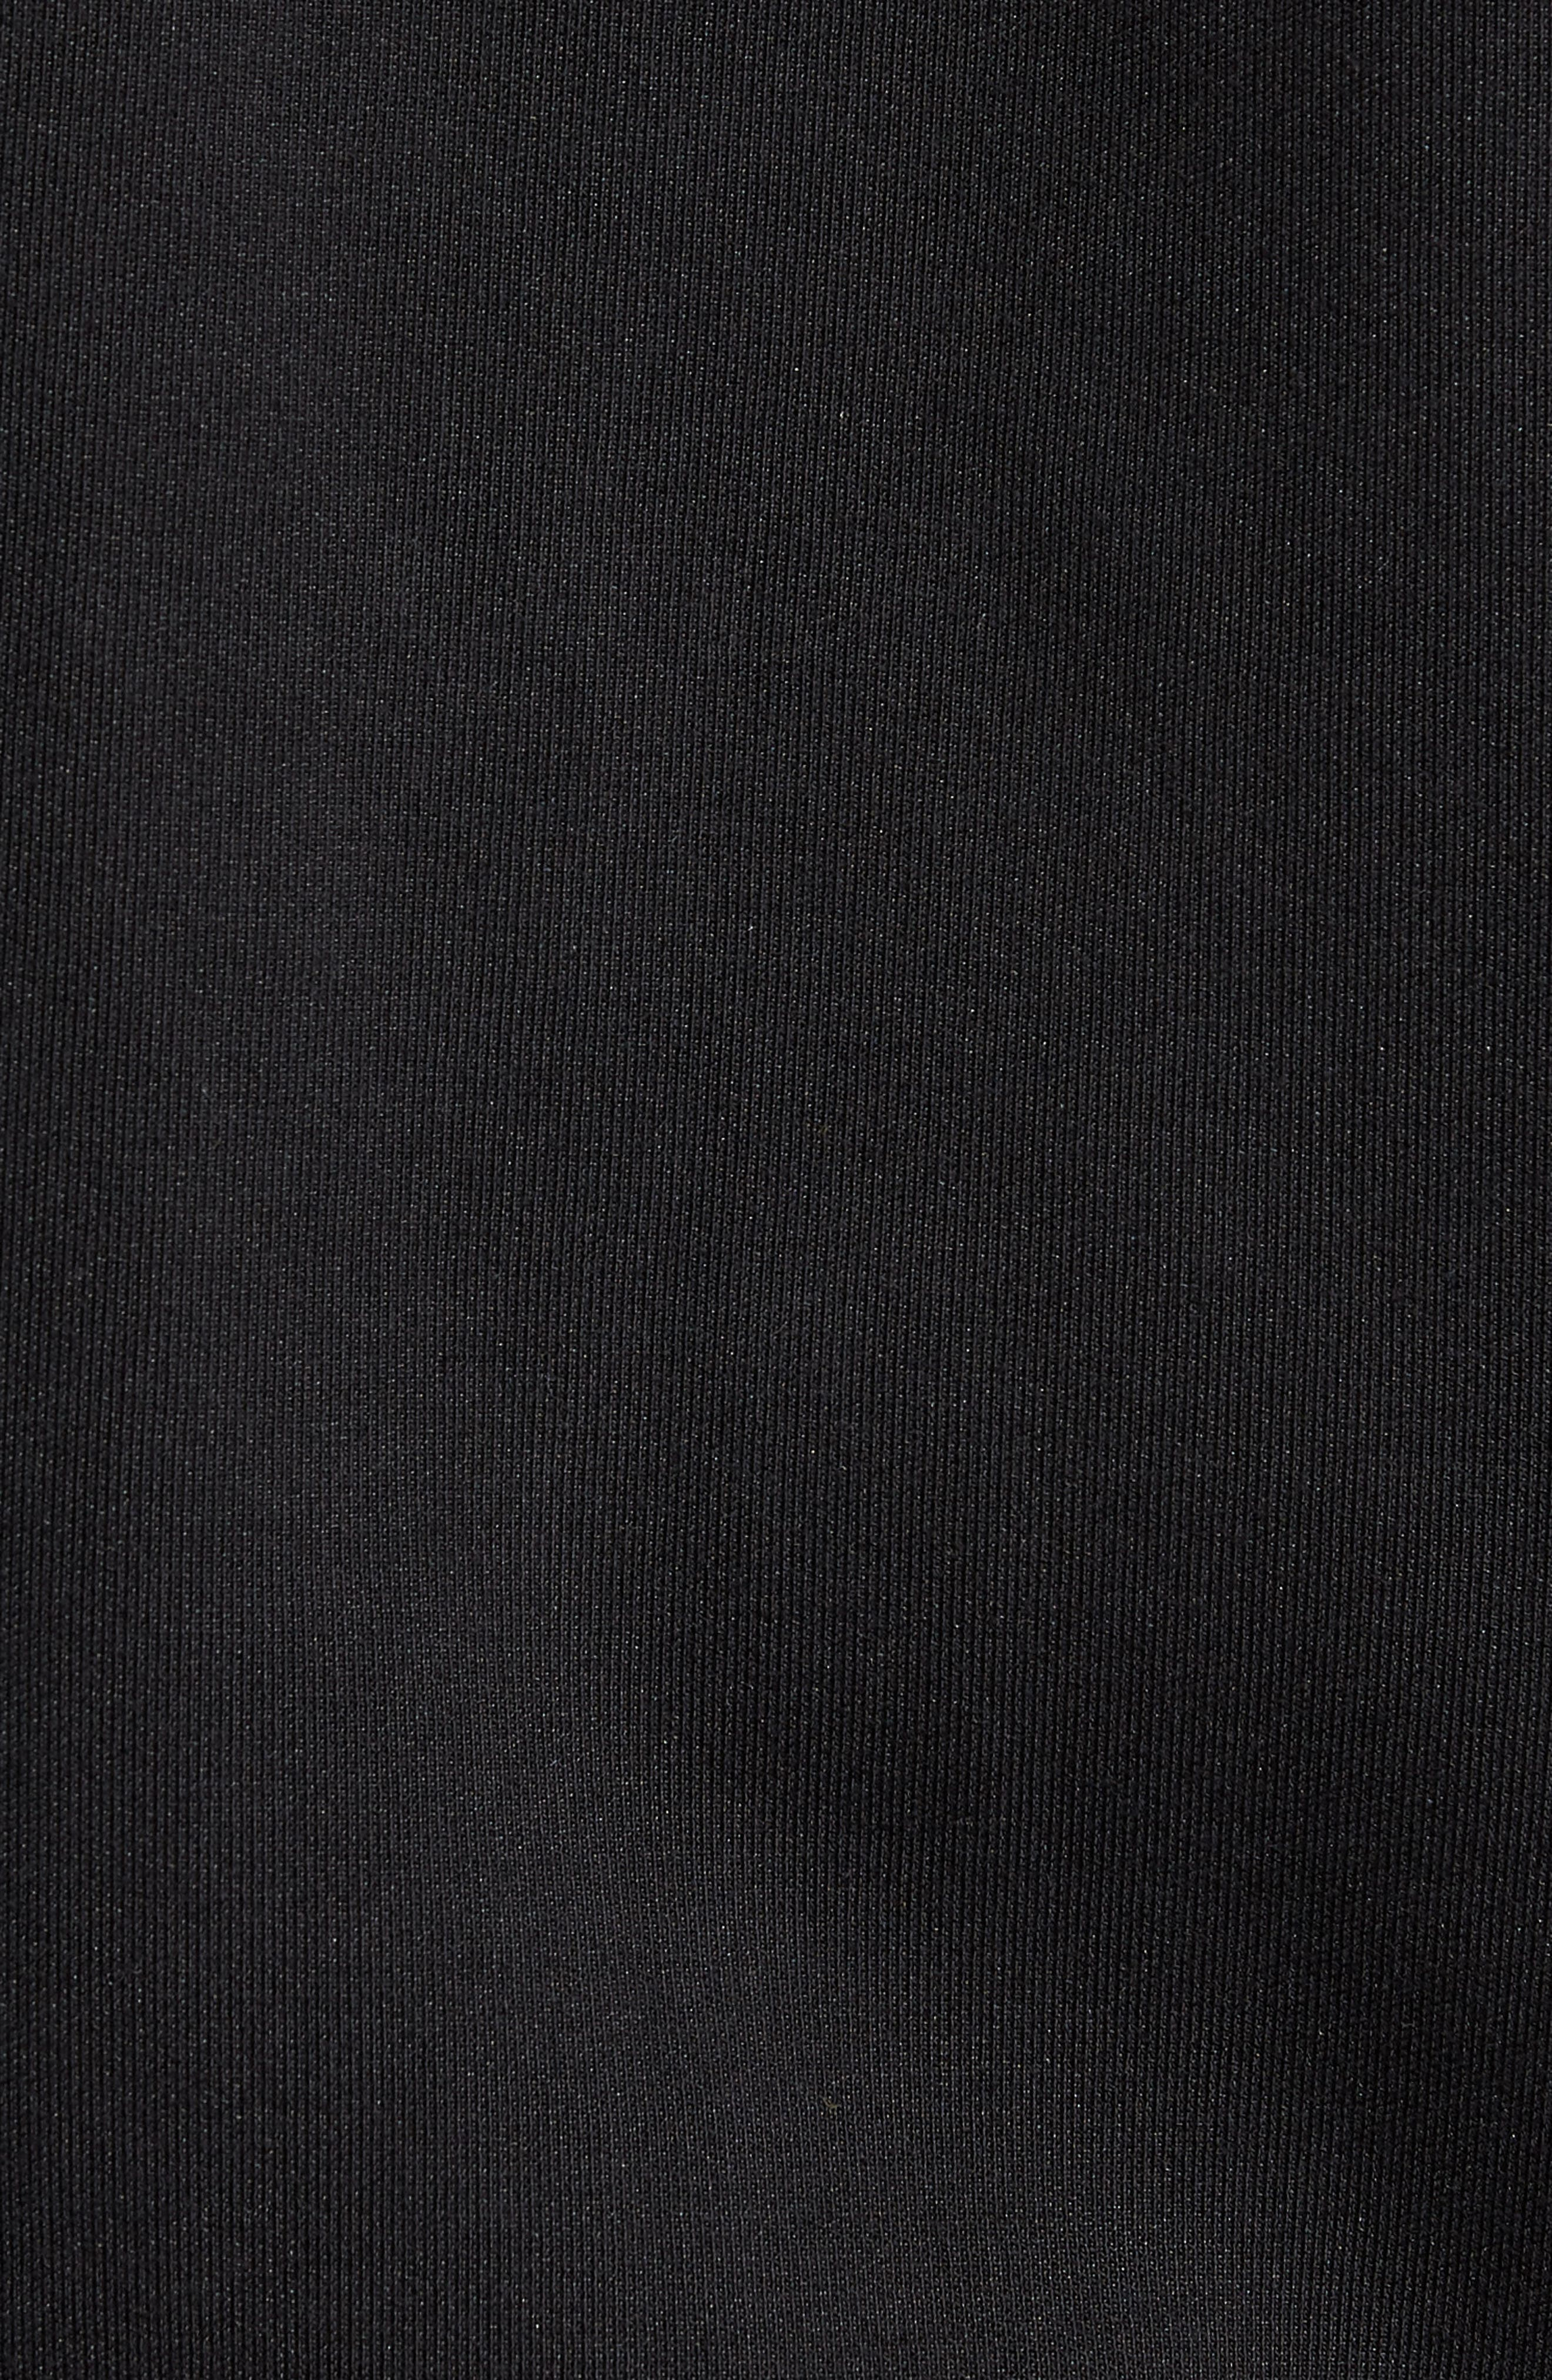 Reverse Tricot Track Jacket,                             Alternate thumbnail 6, color,                             001